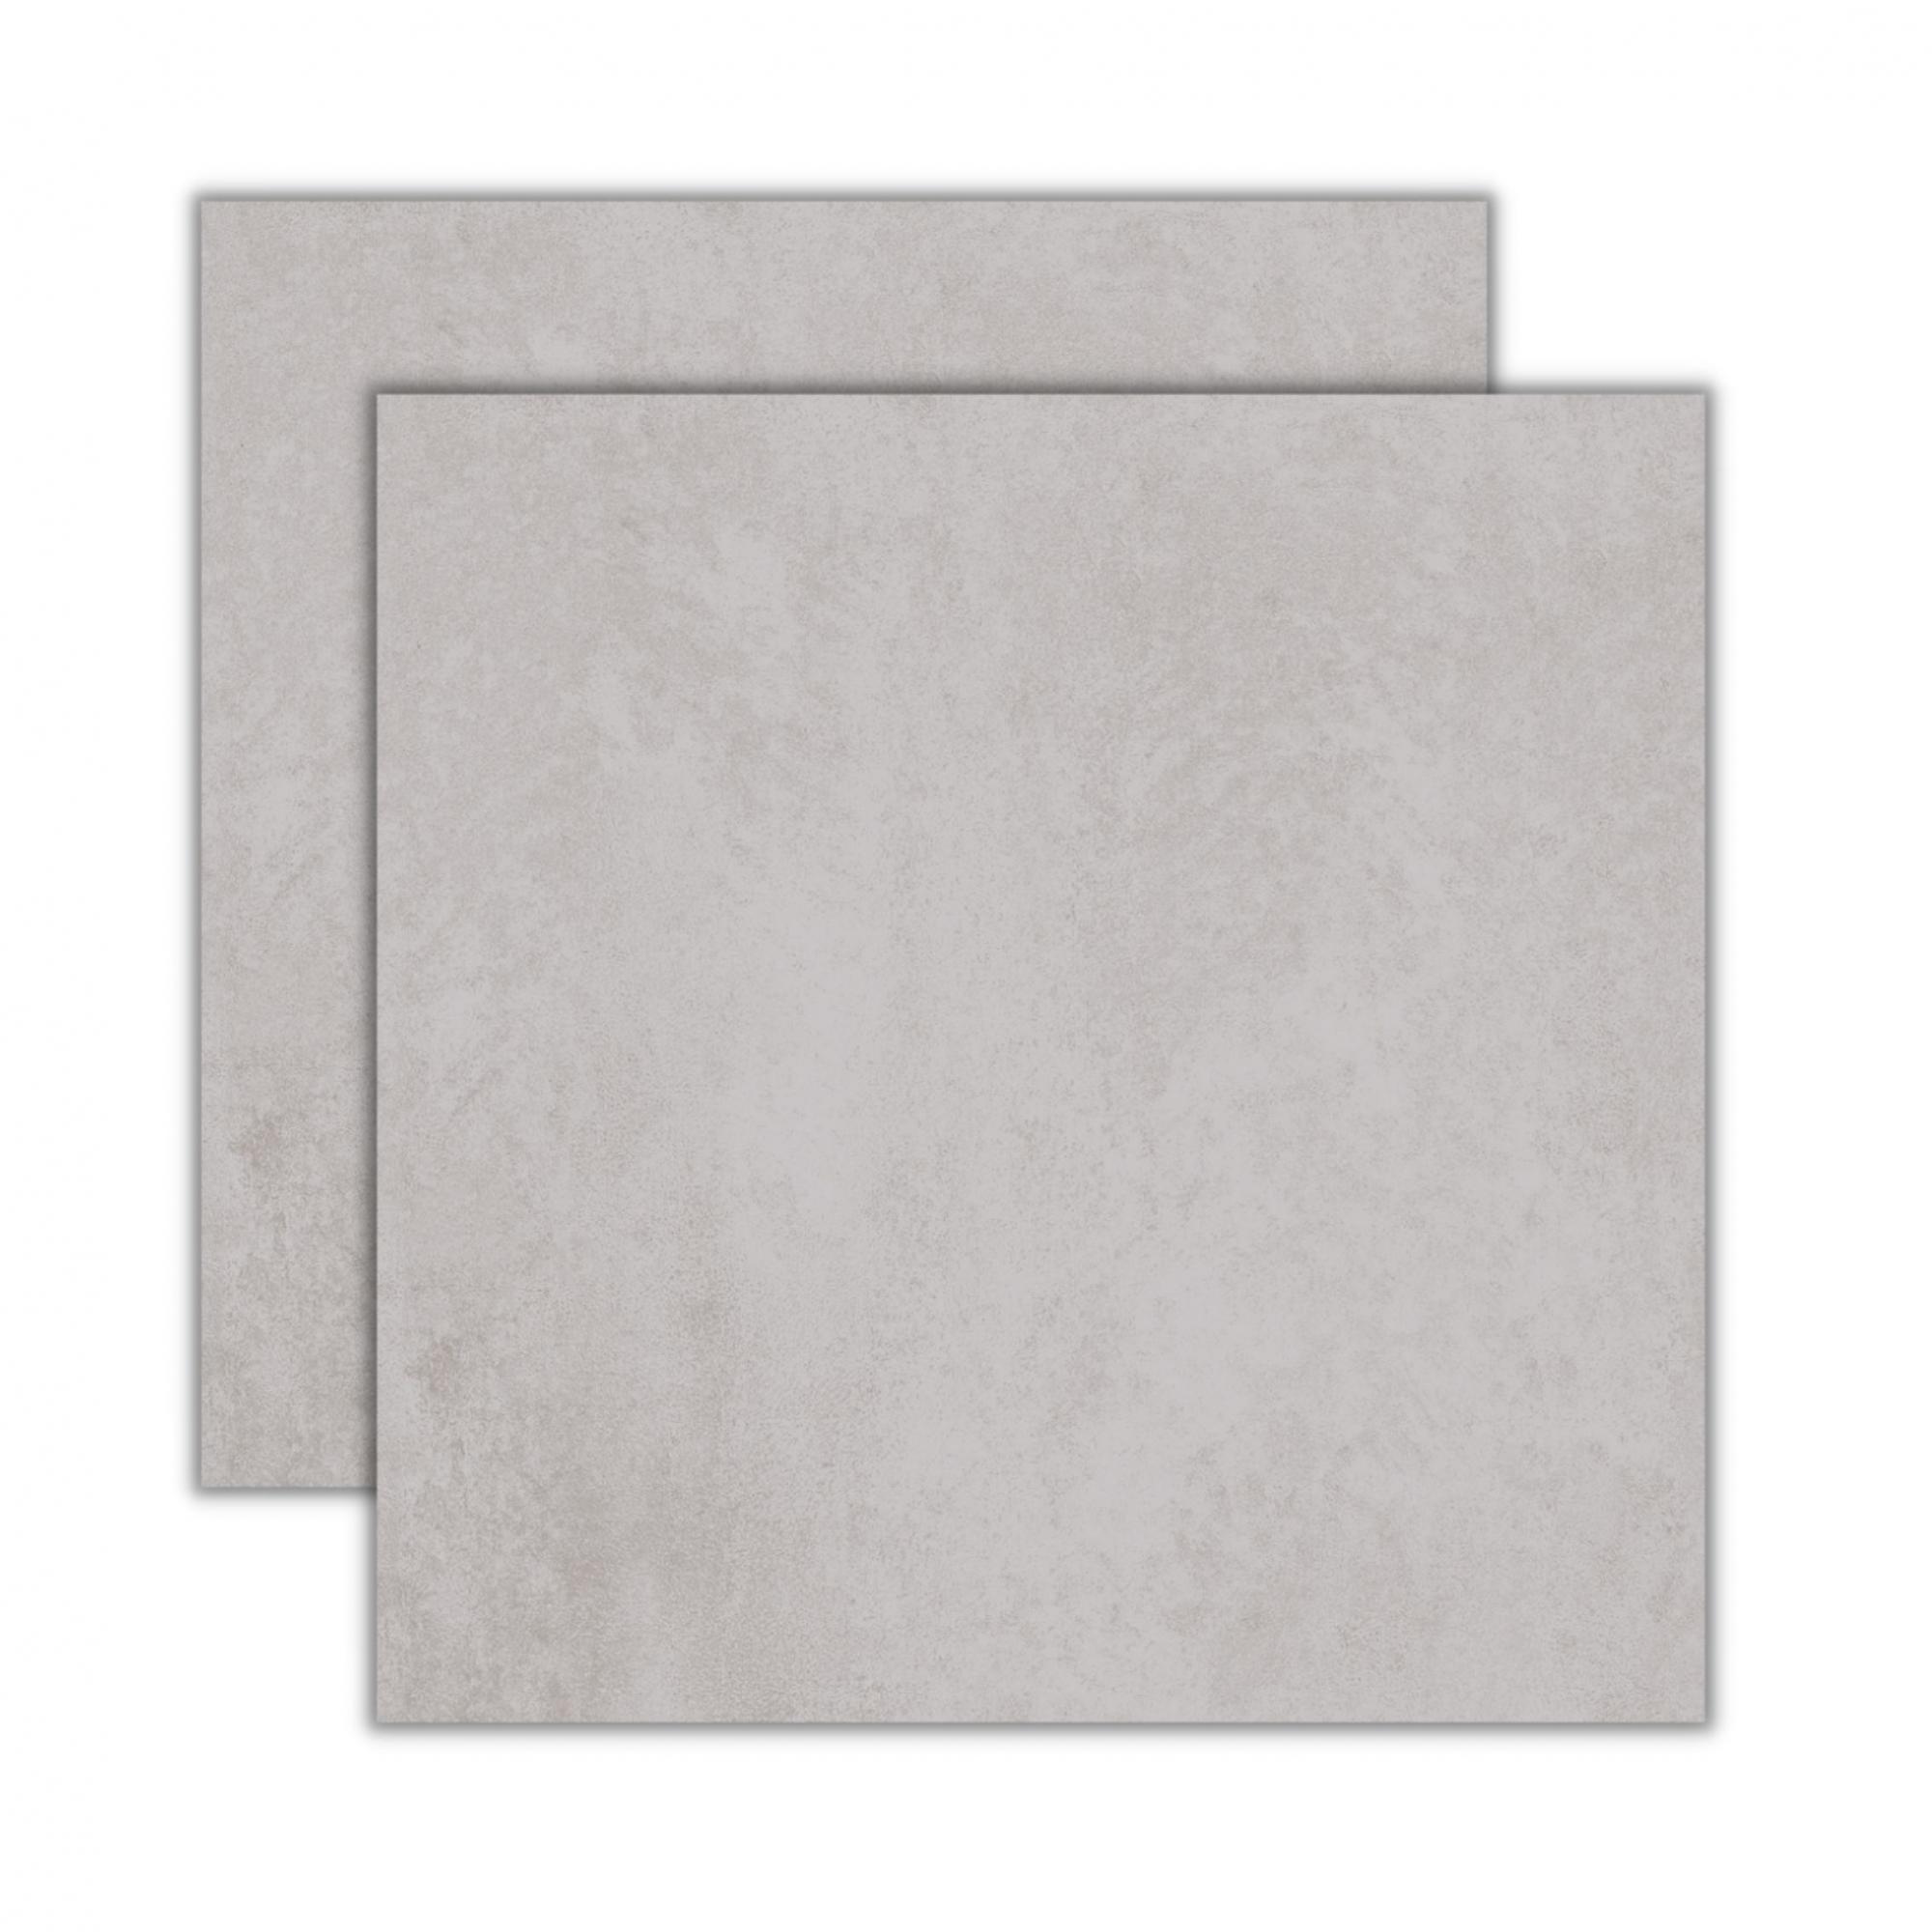 Cemento Grigio 60x60cm<br> <b>R$ 45,90M² </b><br>Cx 2,15 M² &#10132;<b> R$ 98,69</b>